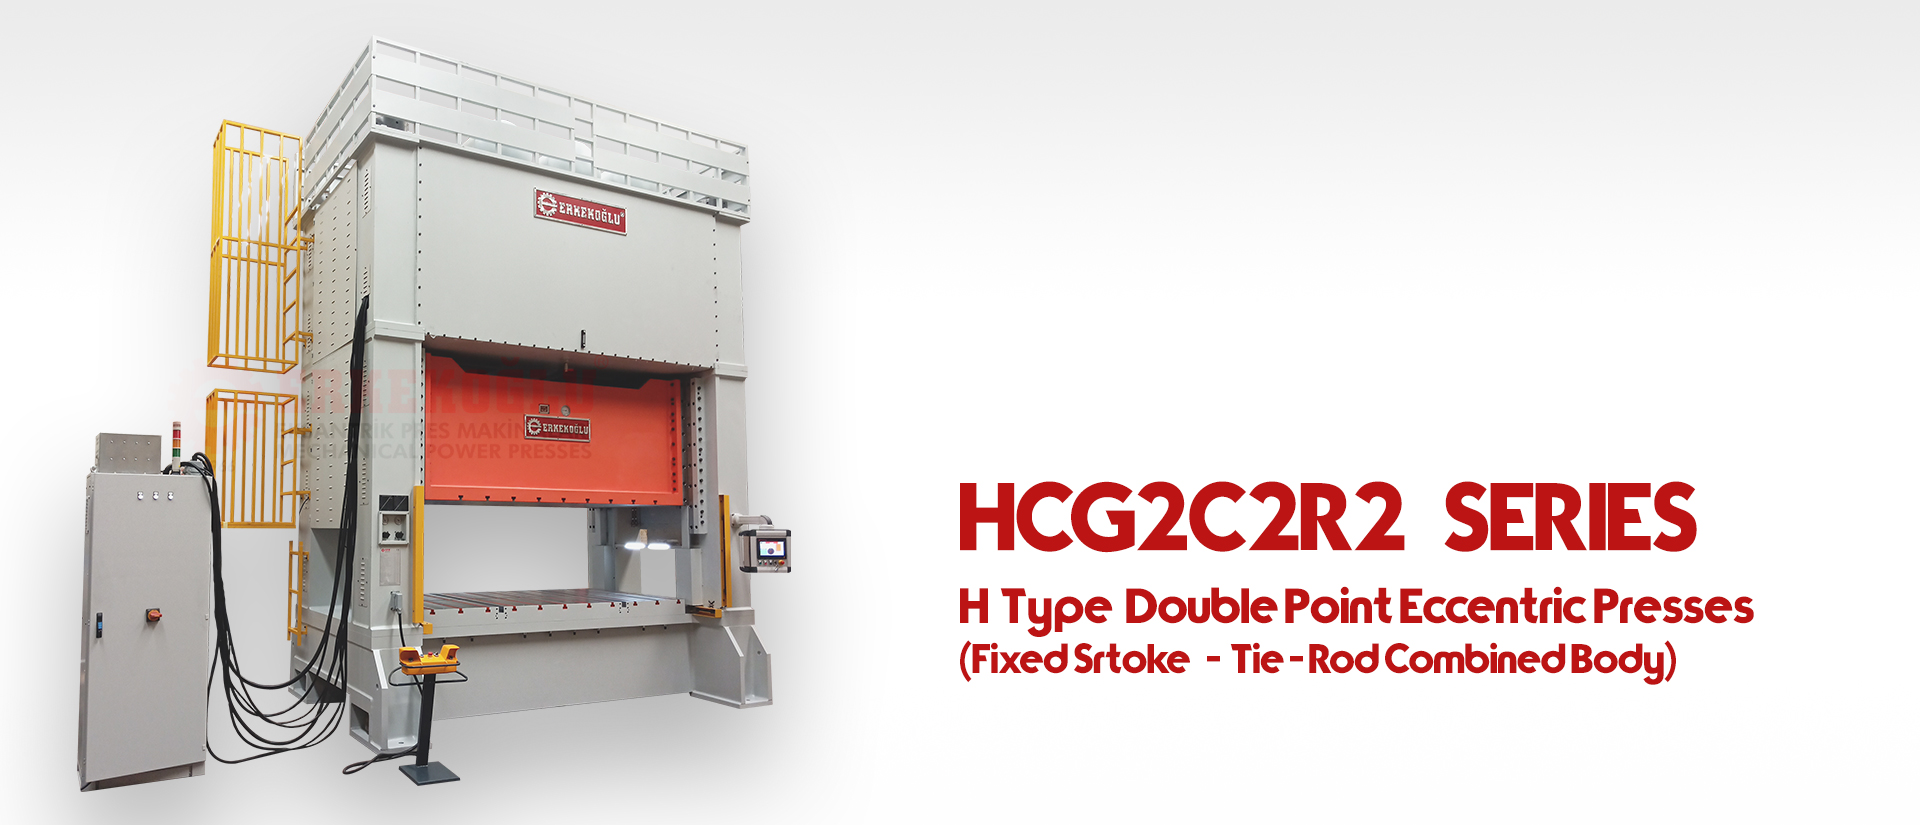 HCG2C2R2-press-machine-top